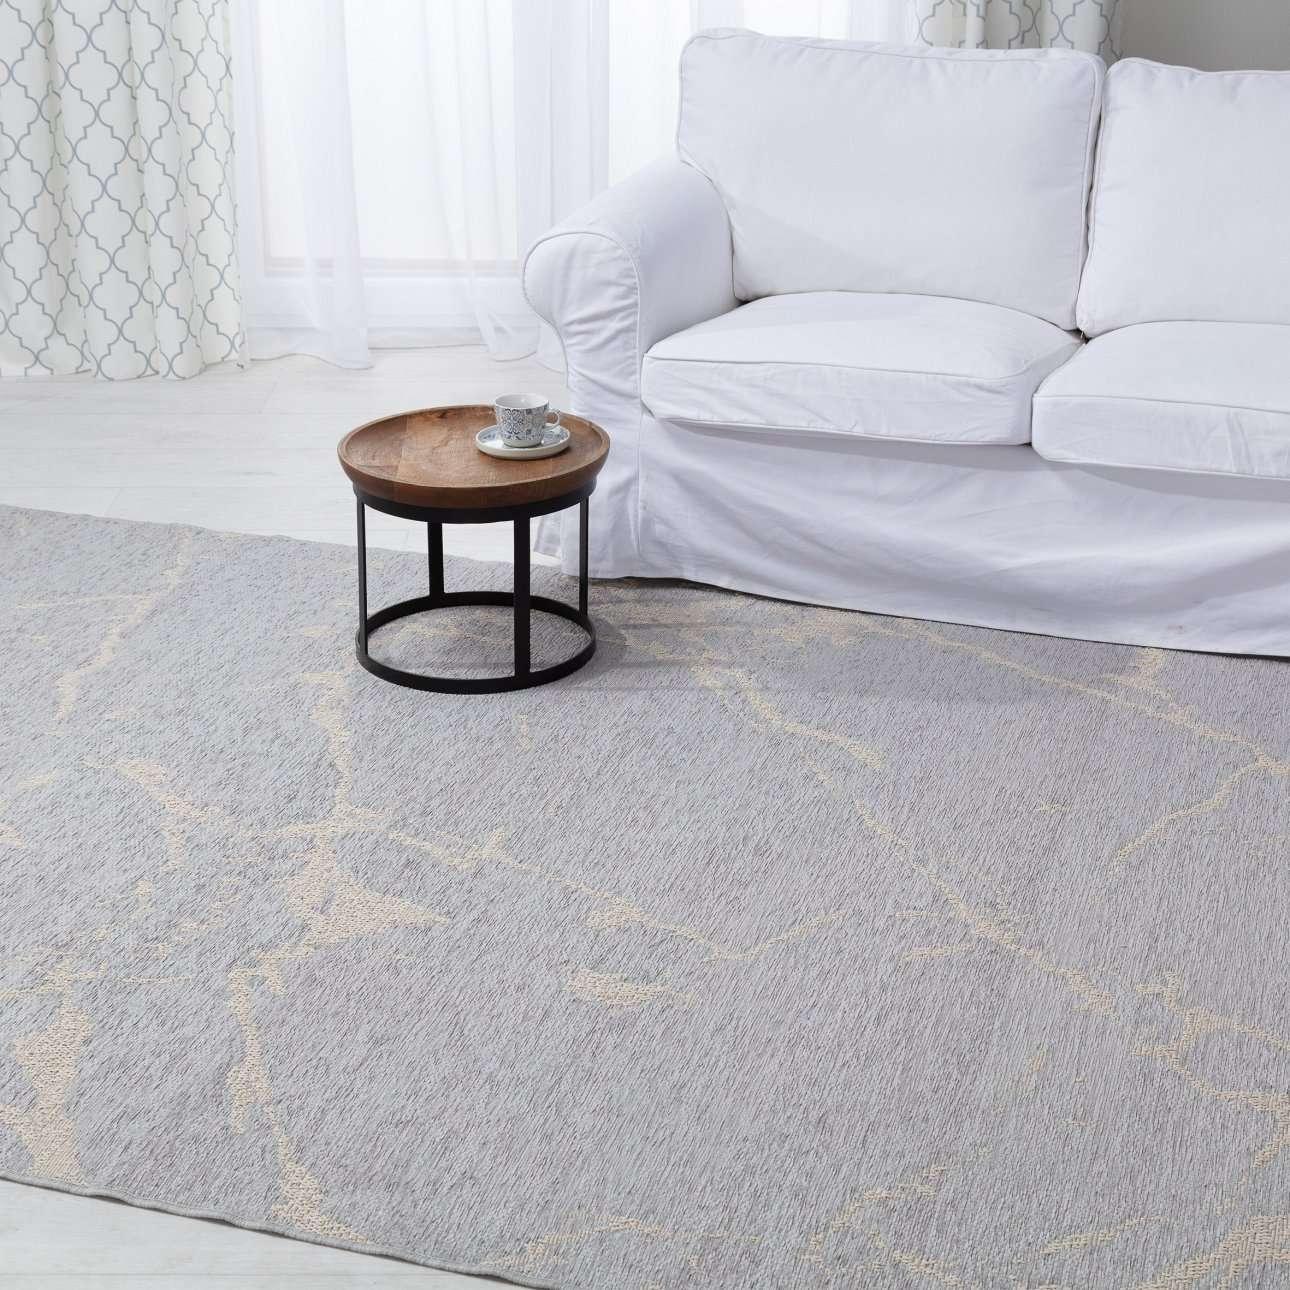 Teppich Velvet wool/grey 200x290cm